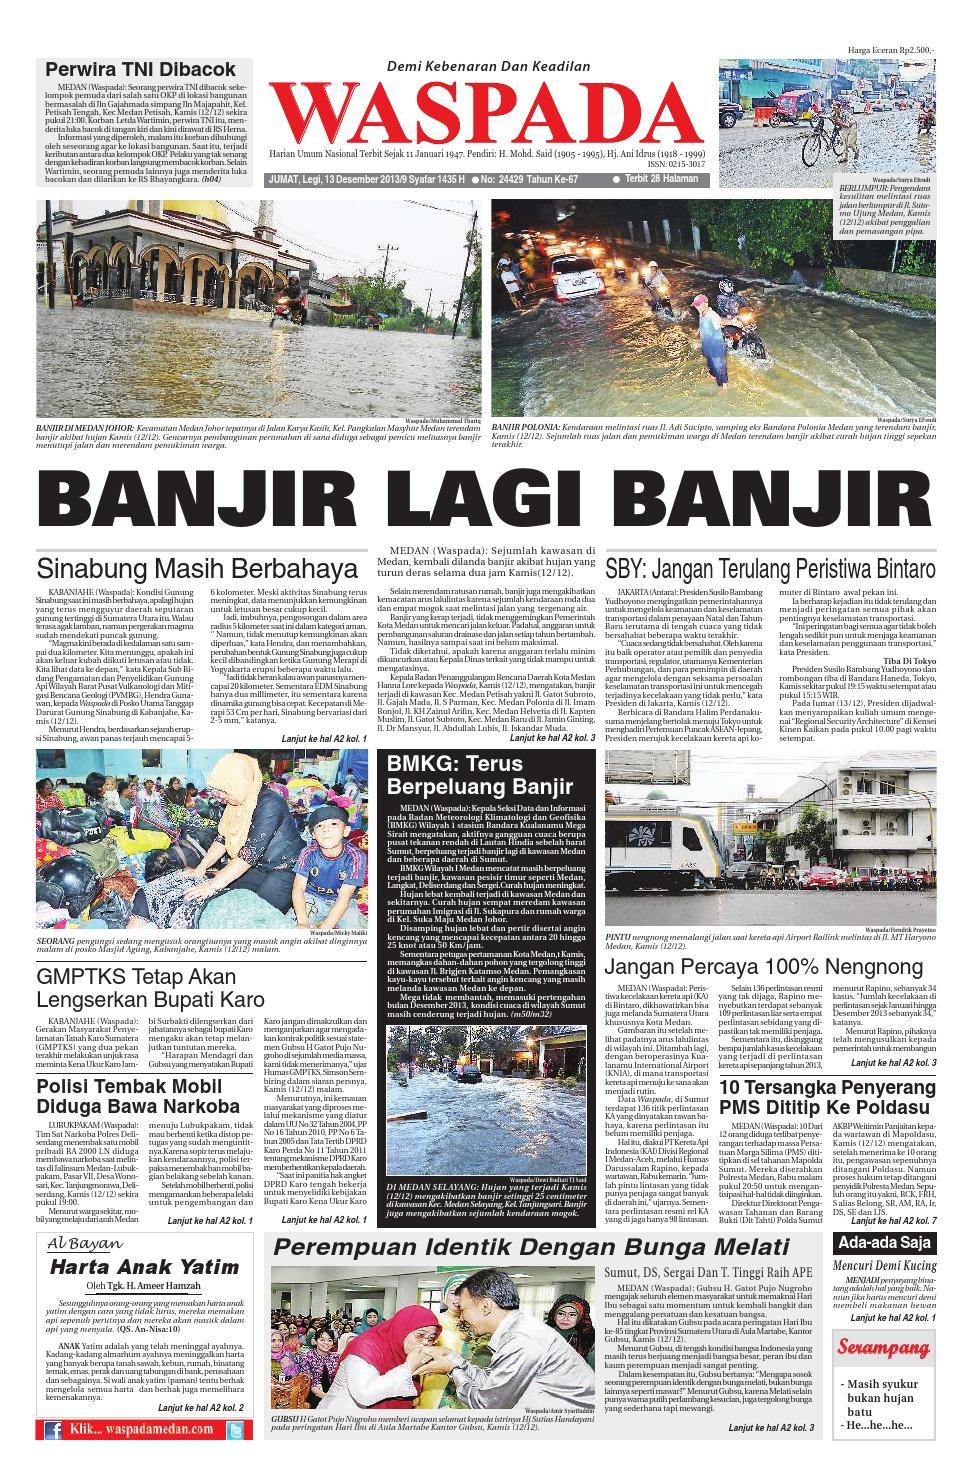 Waspada Jumat 13 Desember 2013 Ok By Harian Issuu Produk Ukm Bumn Madu Super Az Zikra